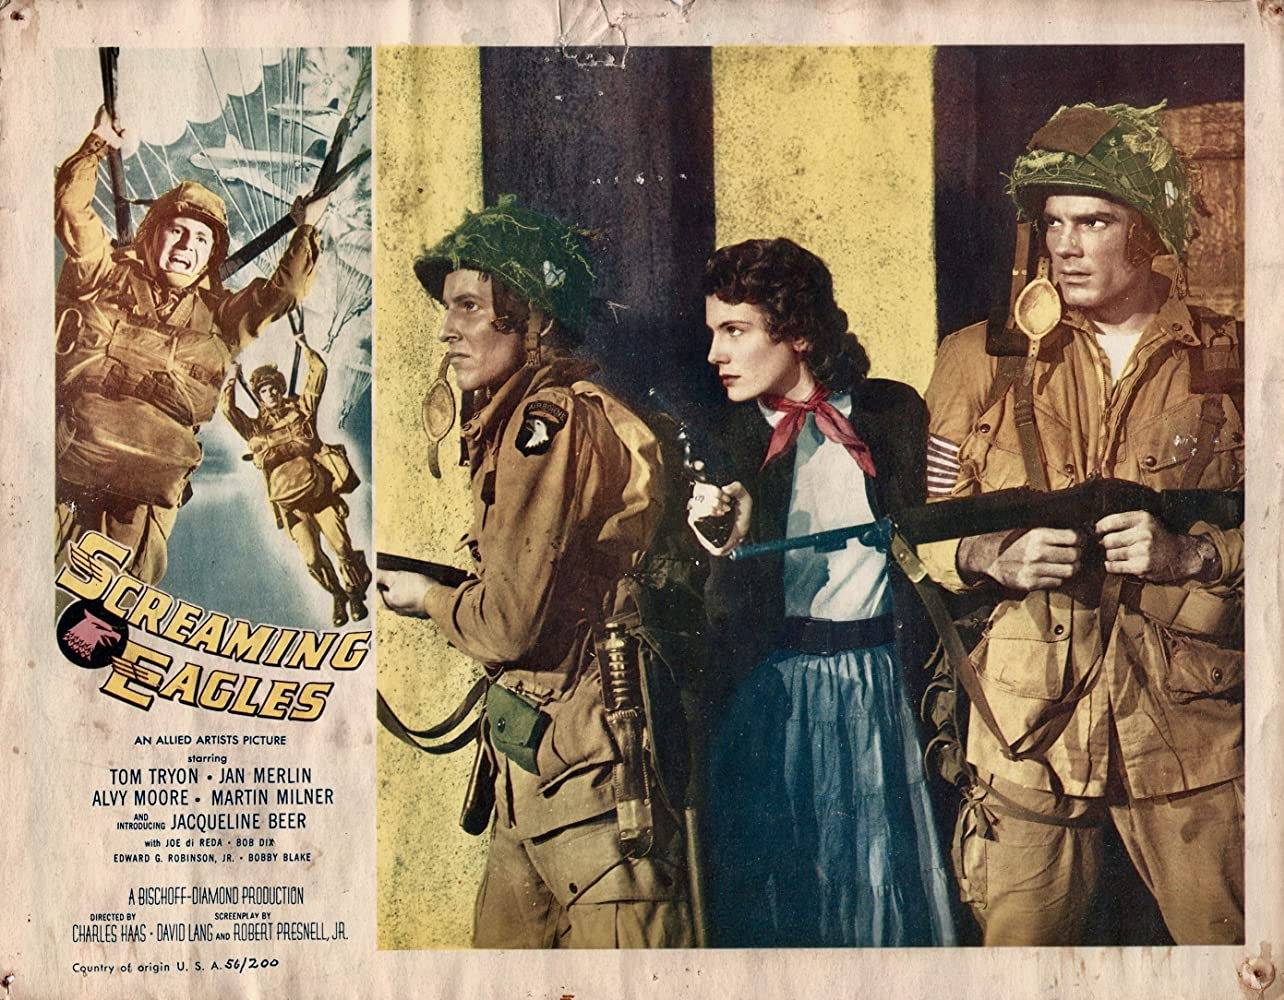 War Movie : Screaming Eagles (1956)